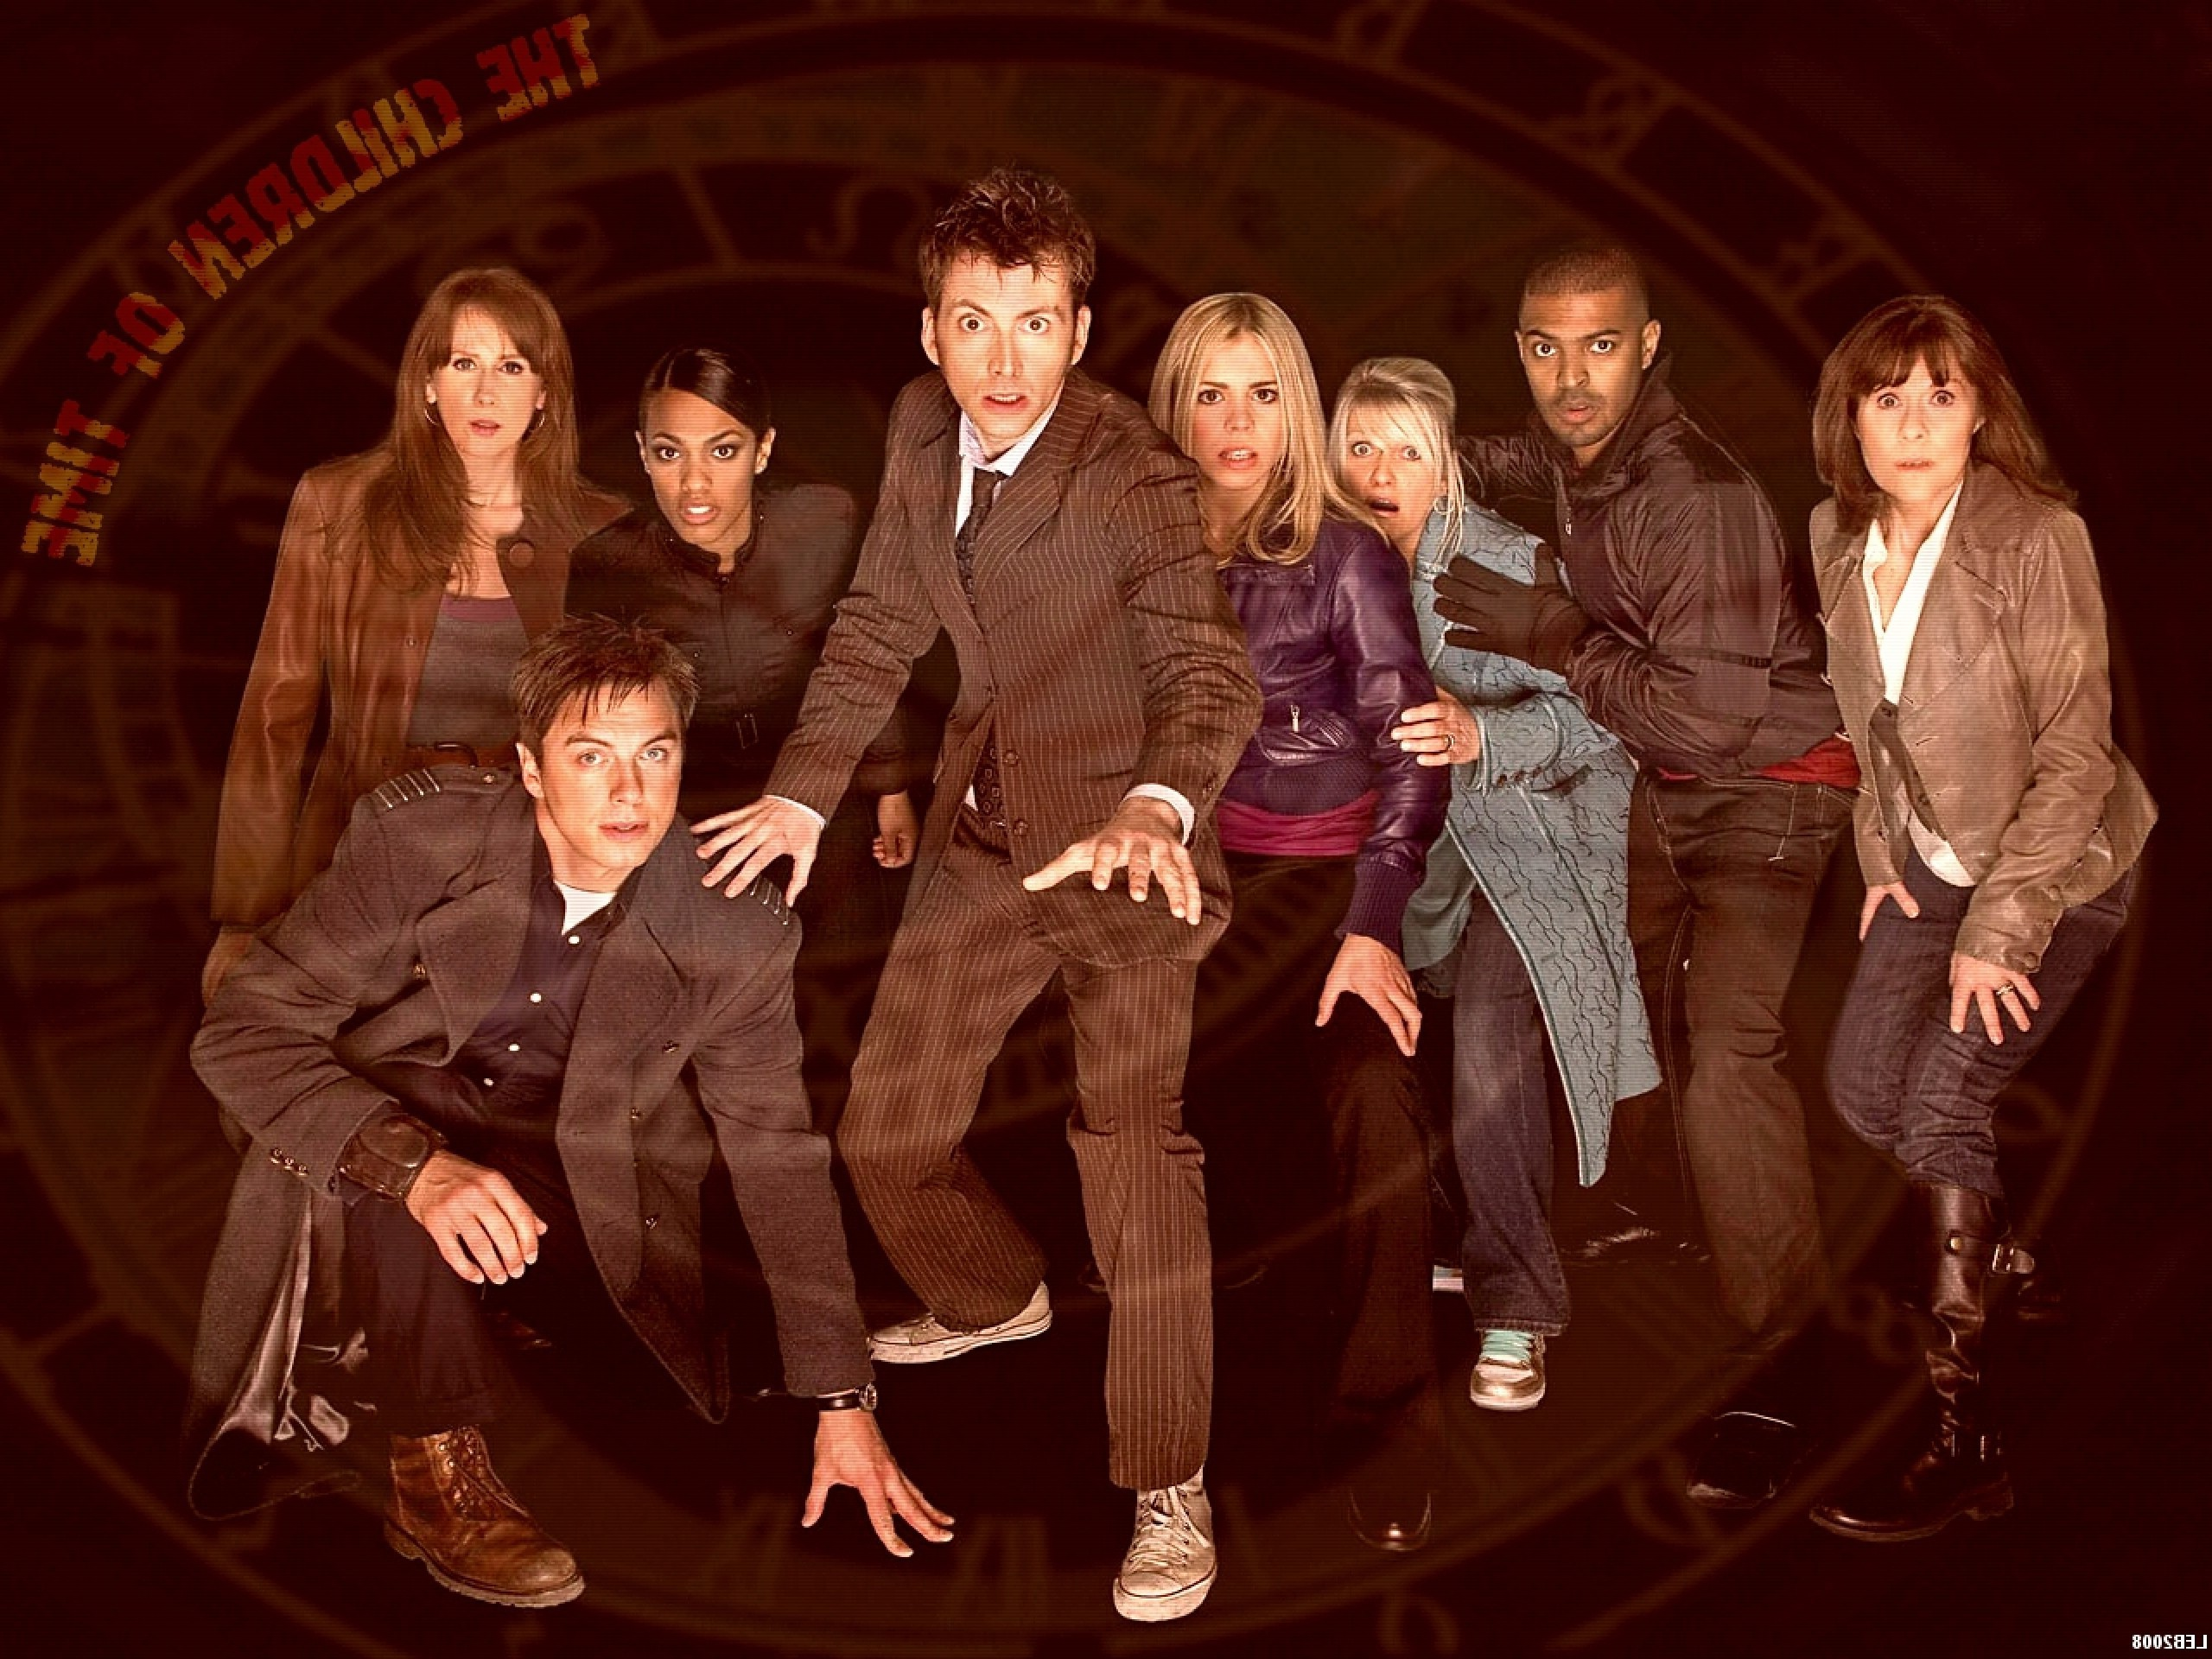 Doctor Who, The Doctor, TARDIS, David Tennant, Billie Piper, John  Barrowman, Rose Tyler, Tenth Doctor, Freema Agyeman Wallpapers HD / Desktop  and Mobile …